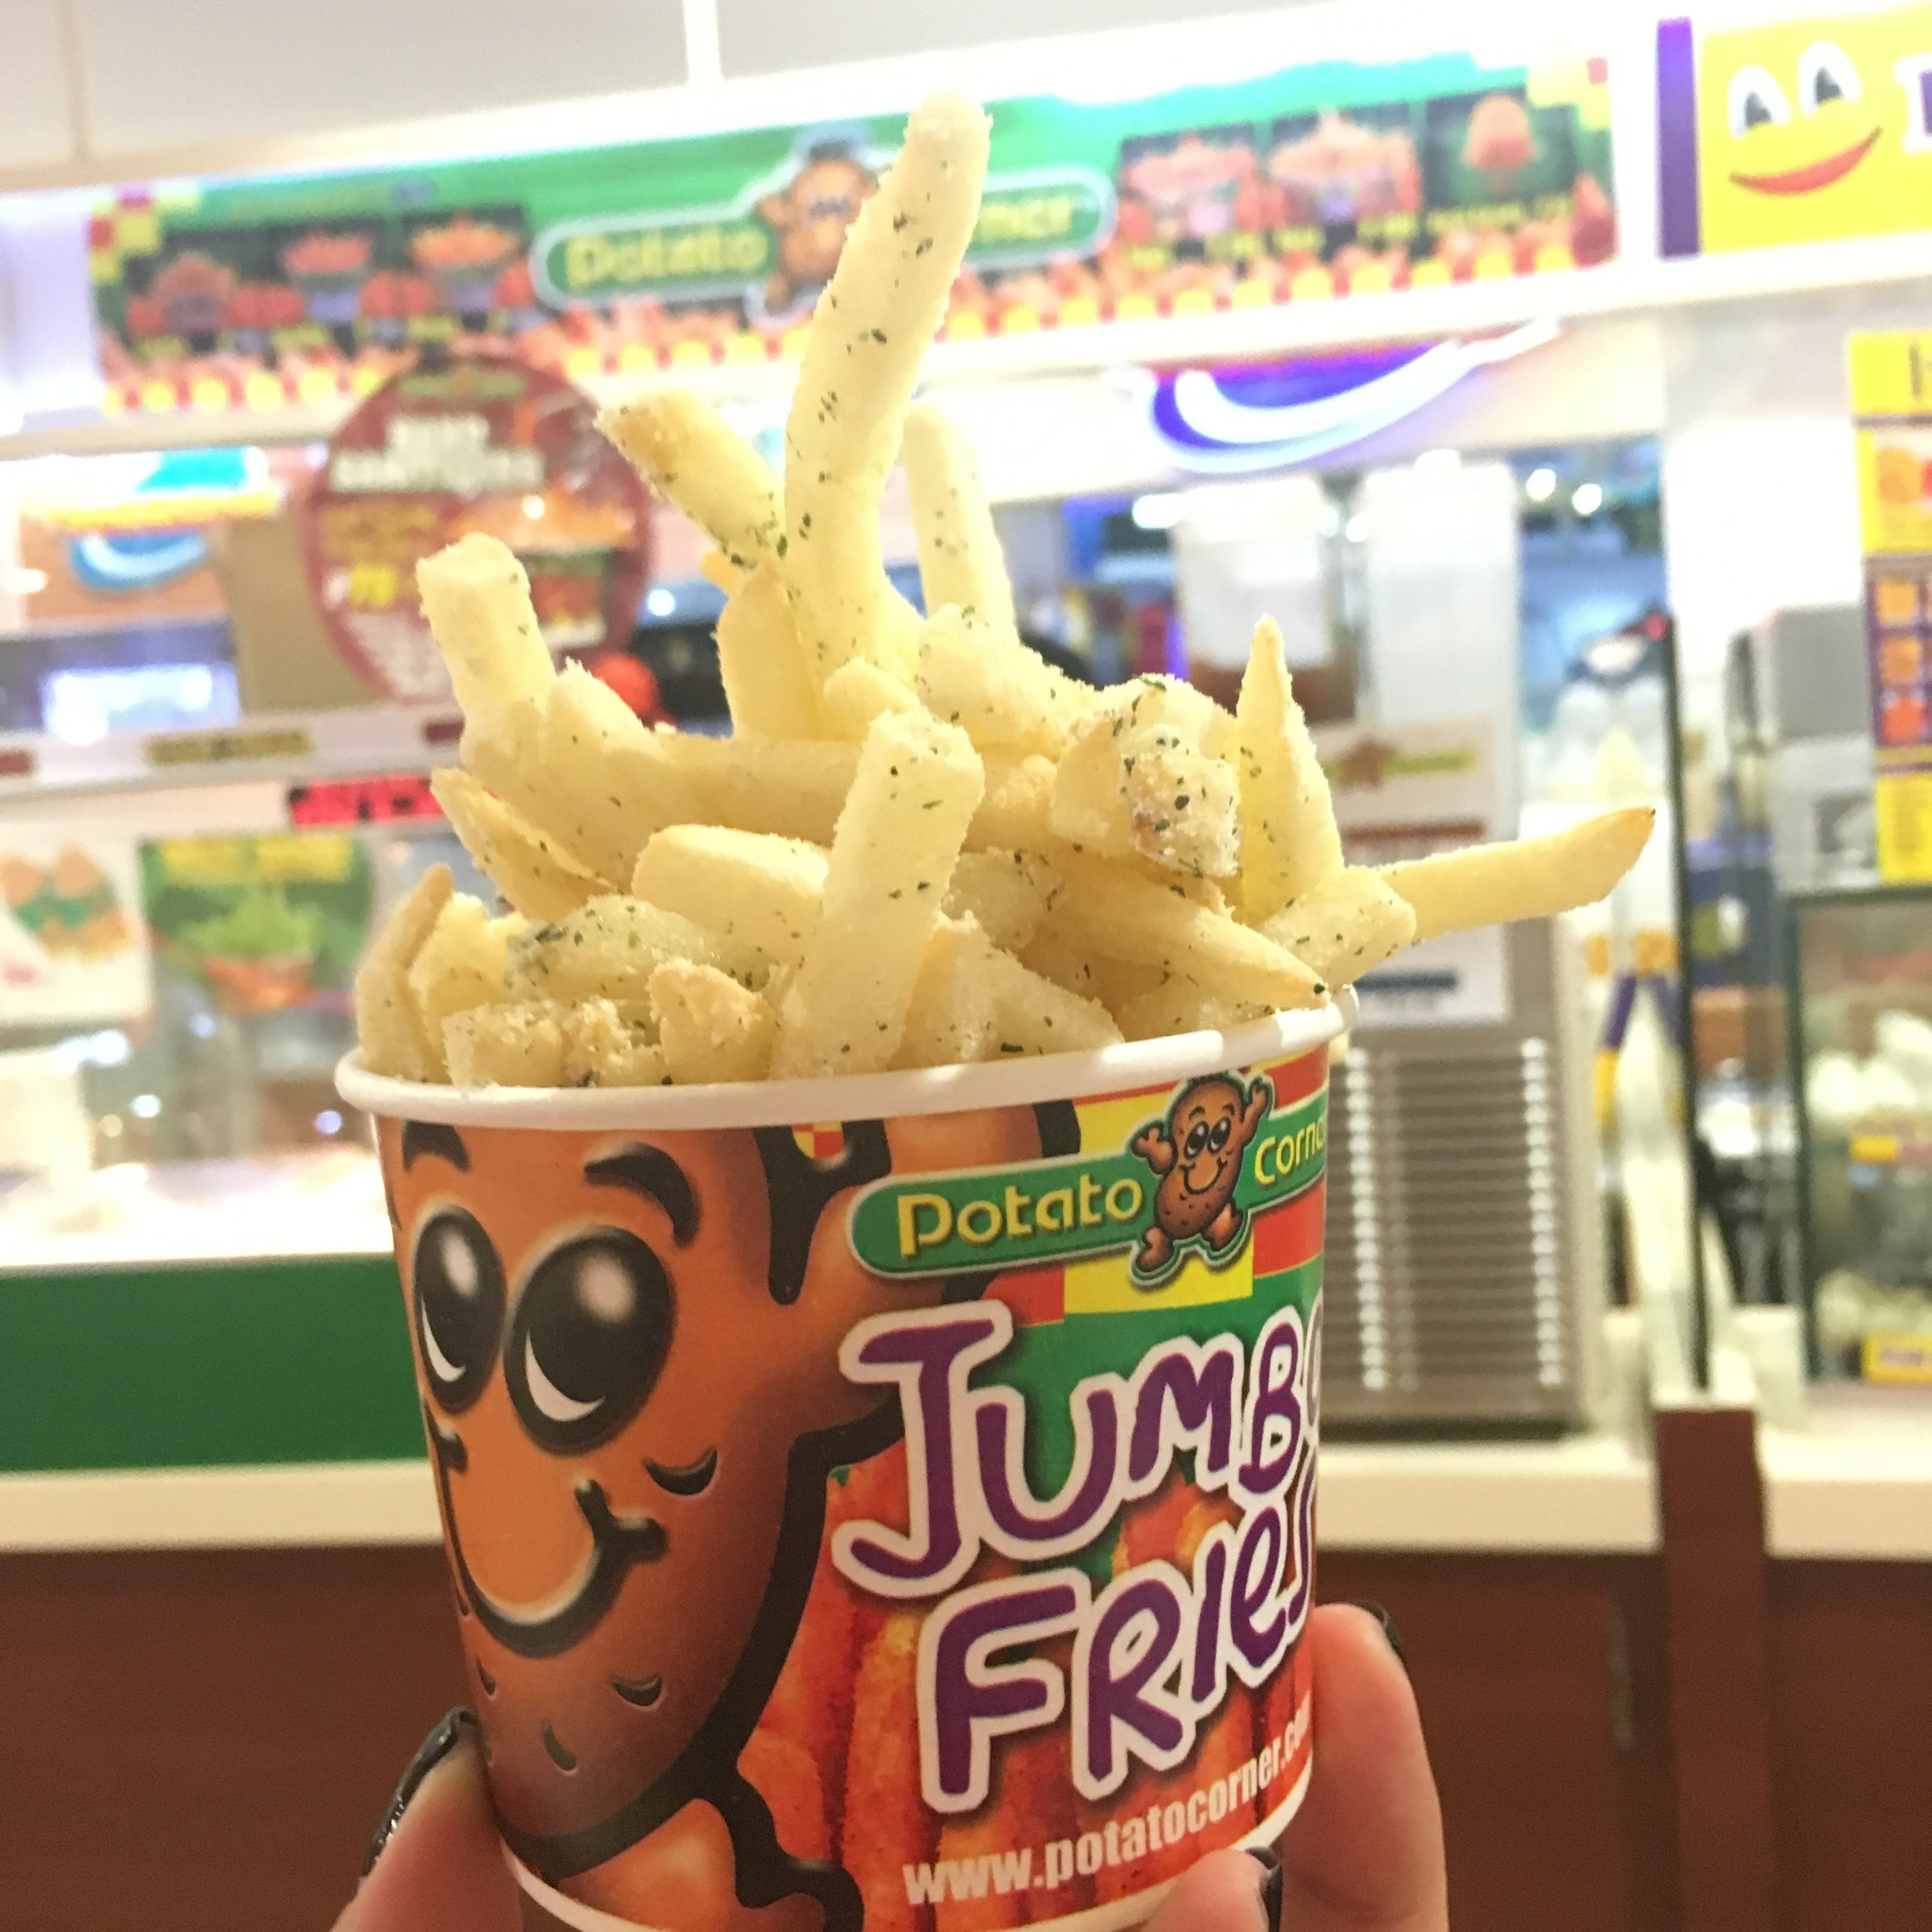 Fries from Potato Corner